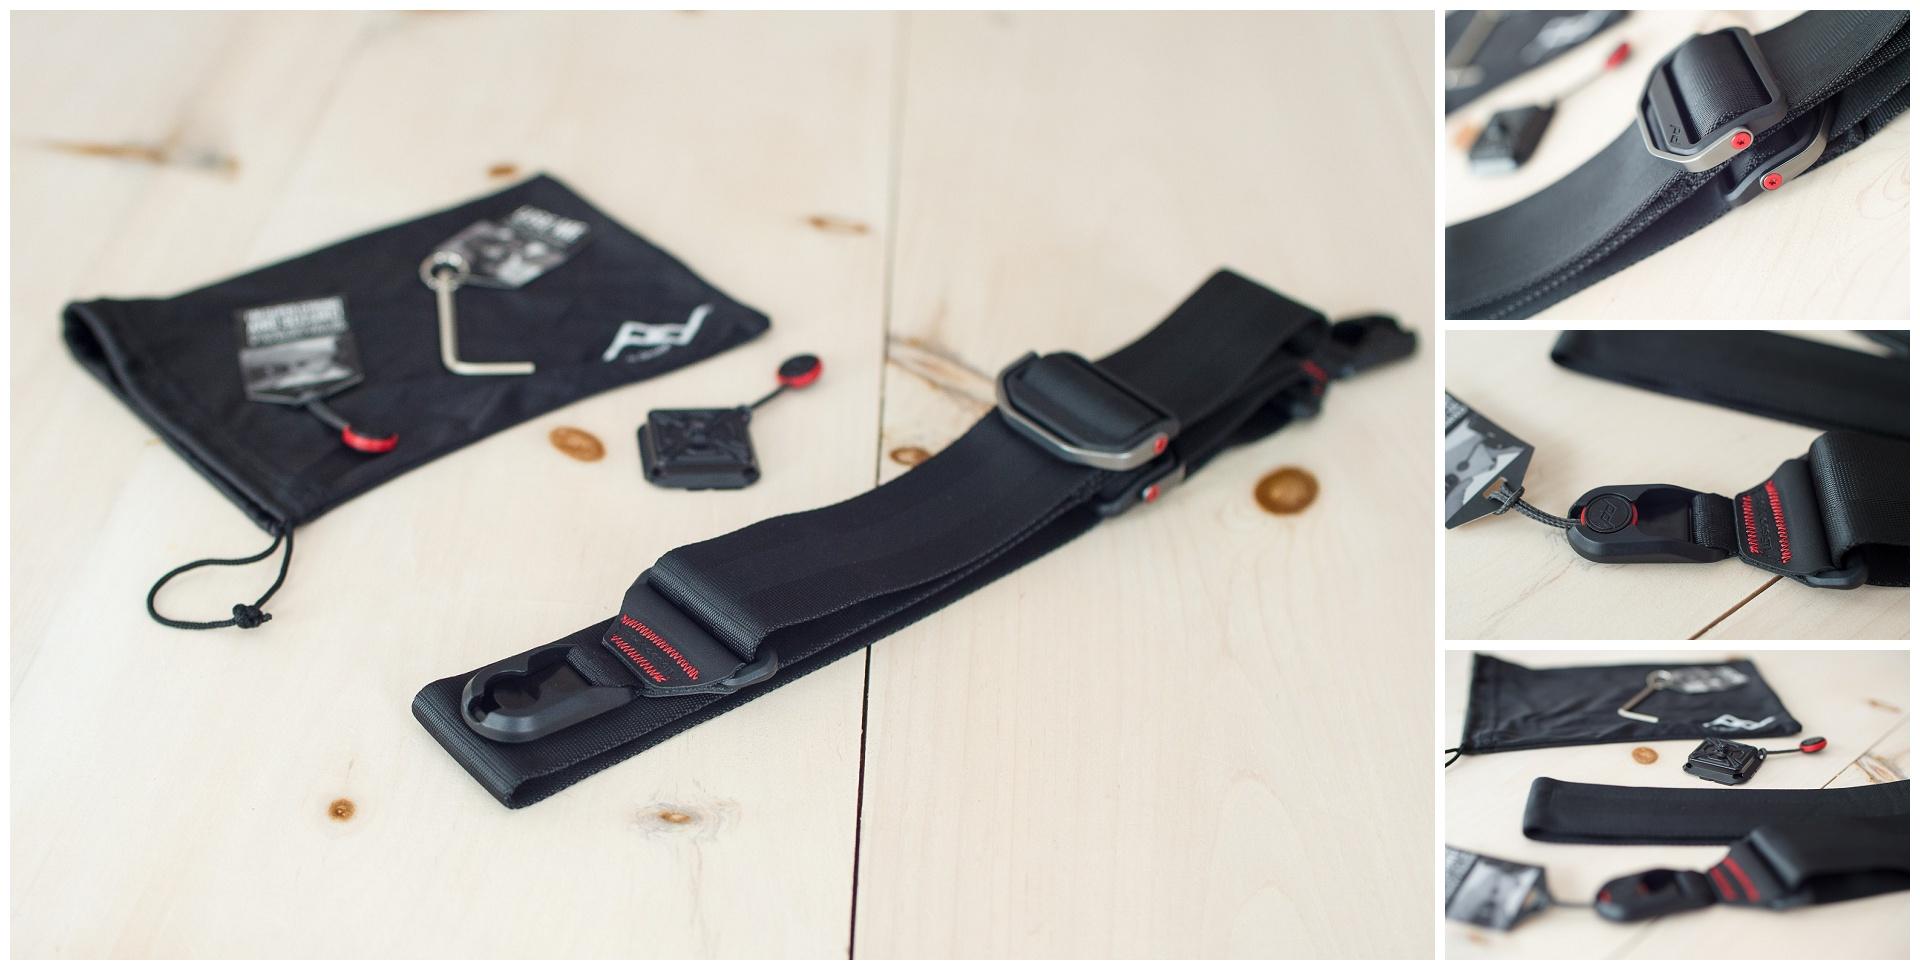 Peak Design's Slide camera strap